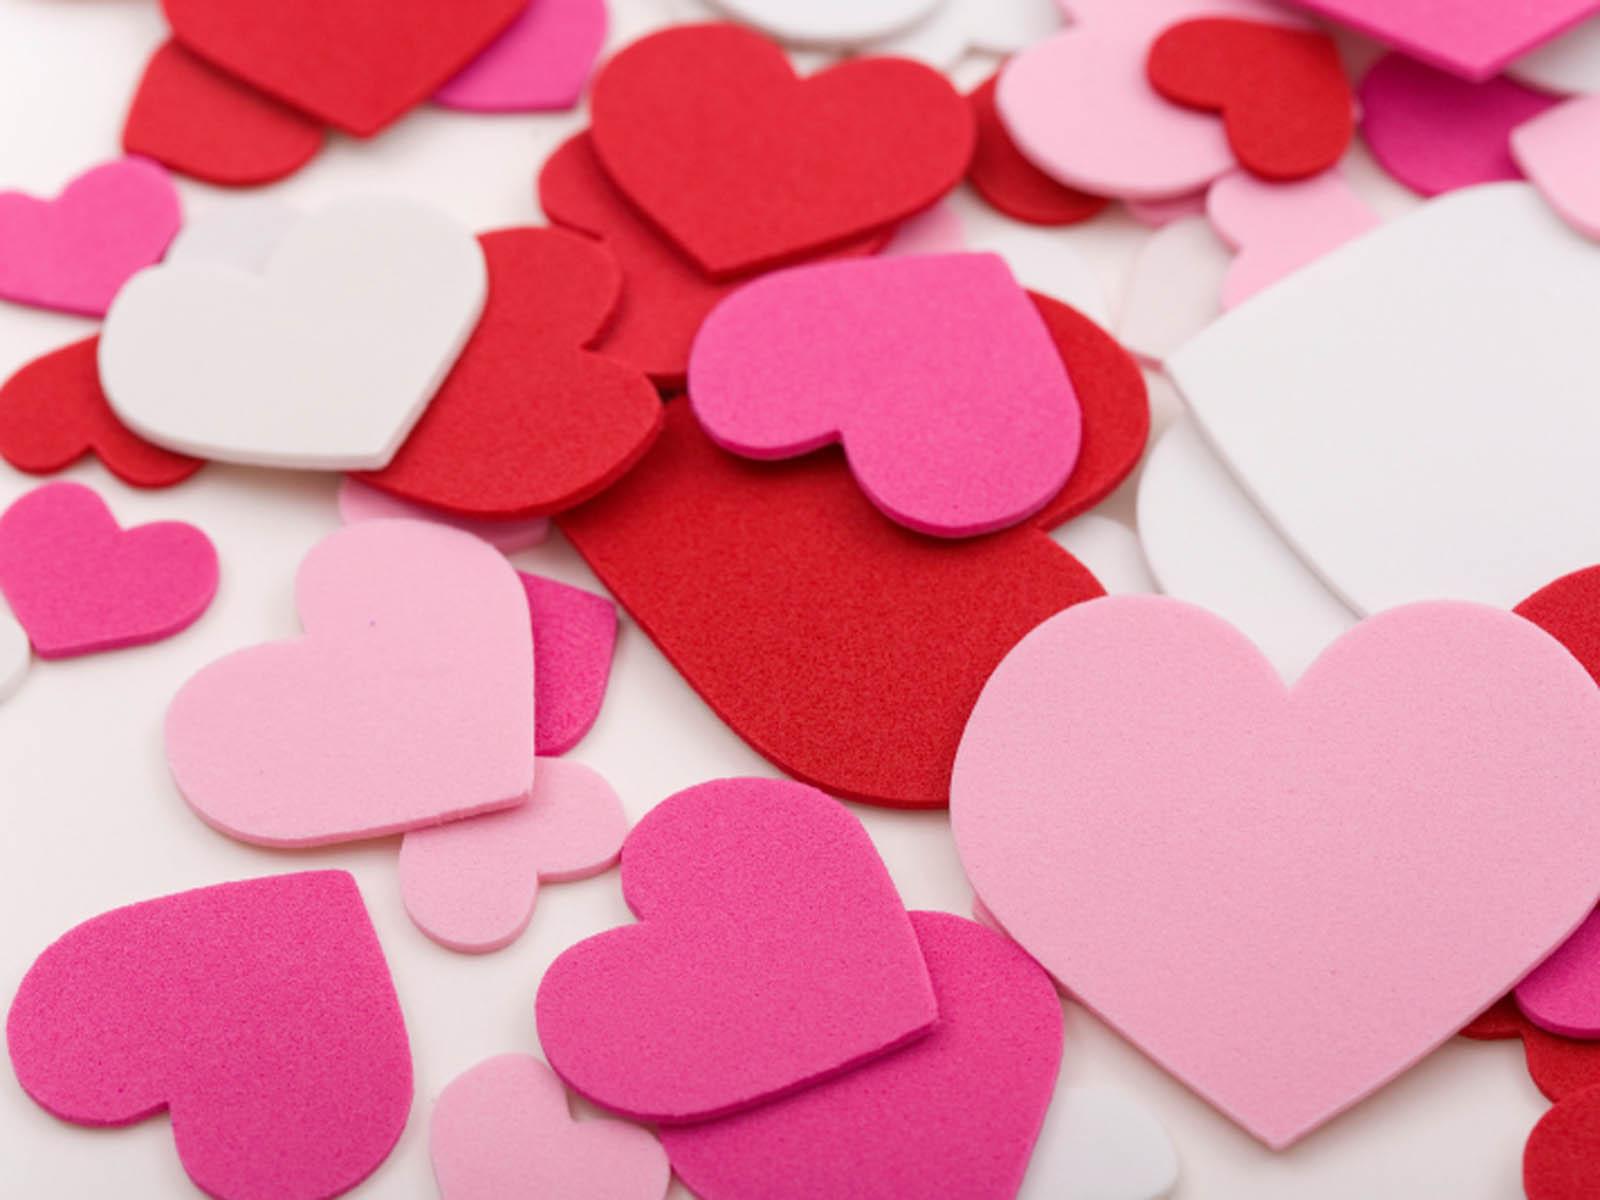 1600x1200px Wallpaper Hearts Love Wallpapersafari